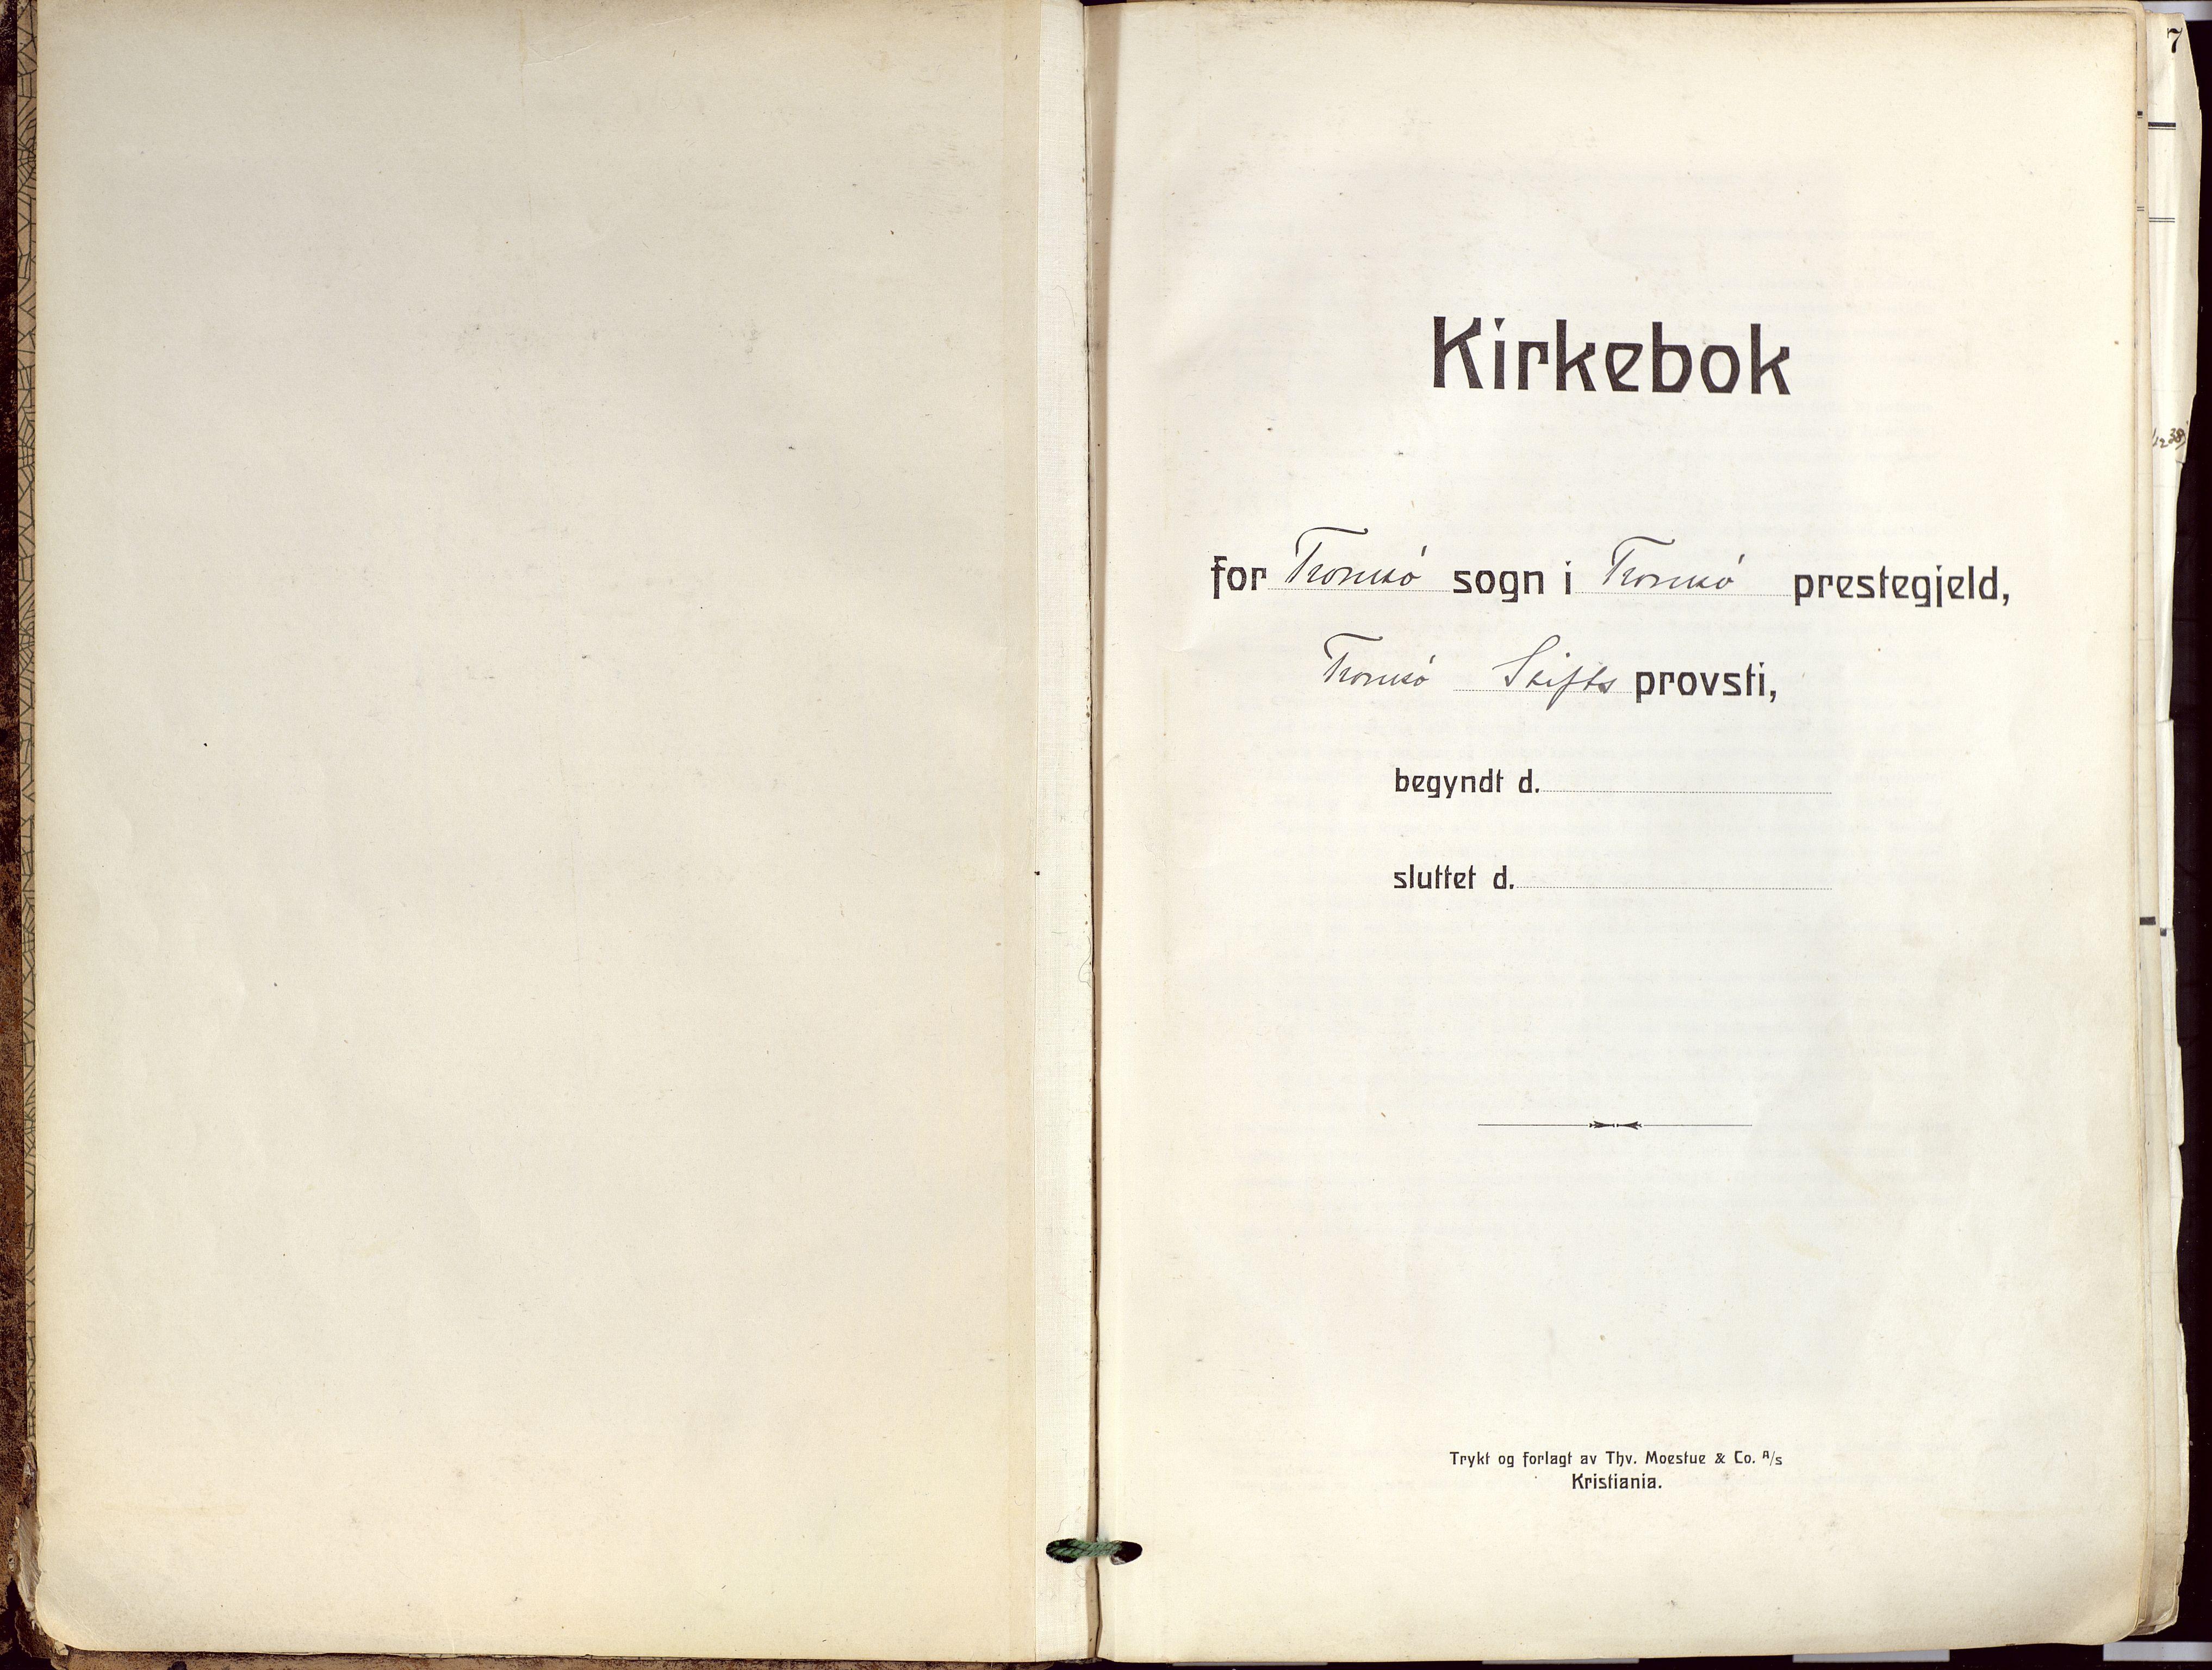 SATØ, Tromsø sokneprestkontor/stiftsprosti/domprosti, G/Ga/L0019kirke: Ministerialbok nr. 19, 1917-1927